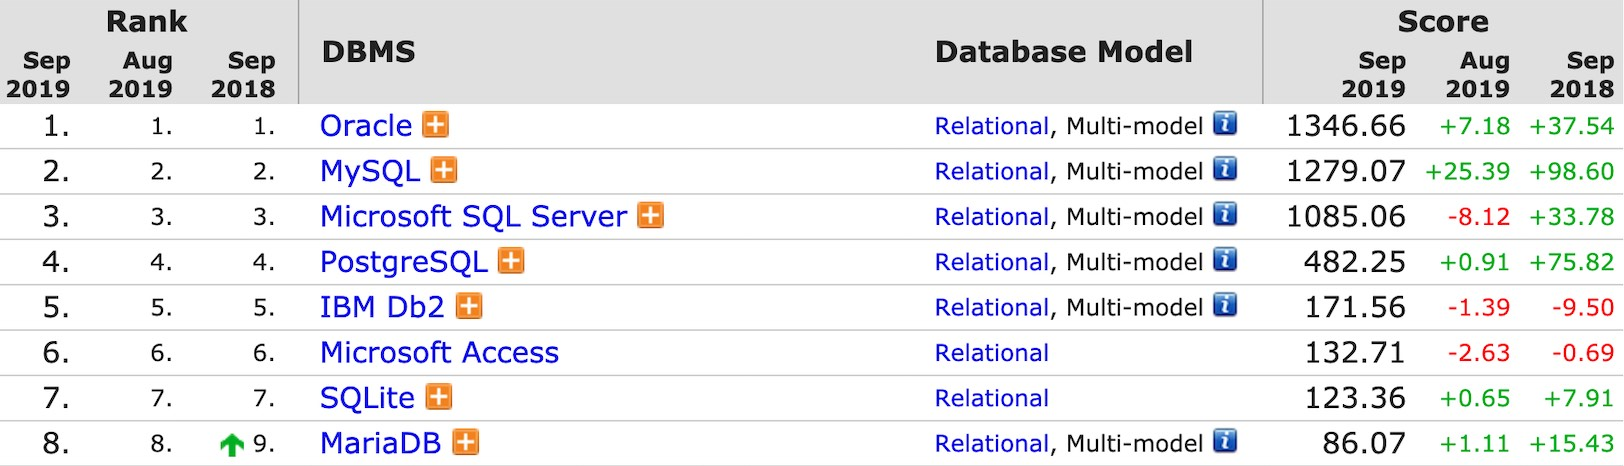 Relational Database Comparison